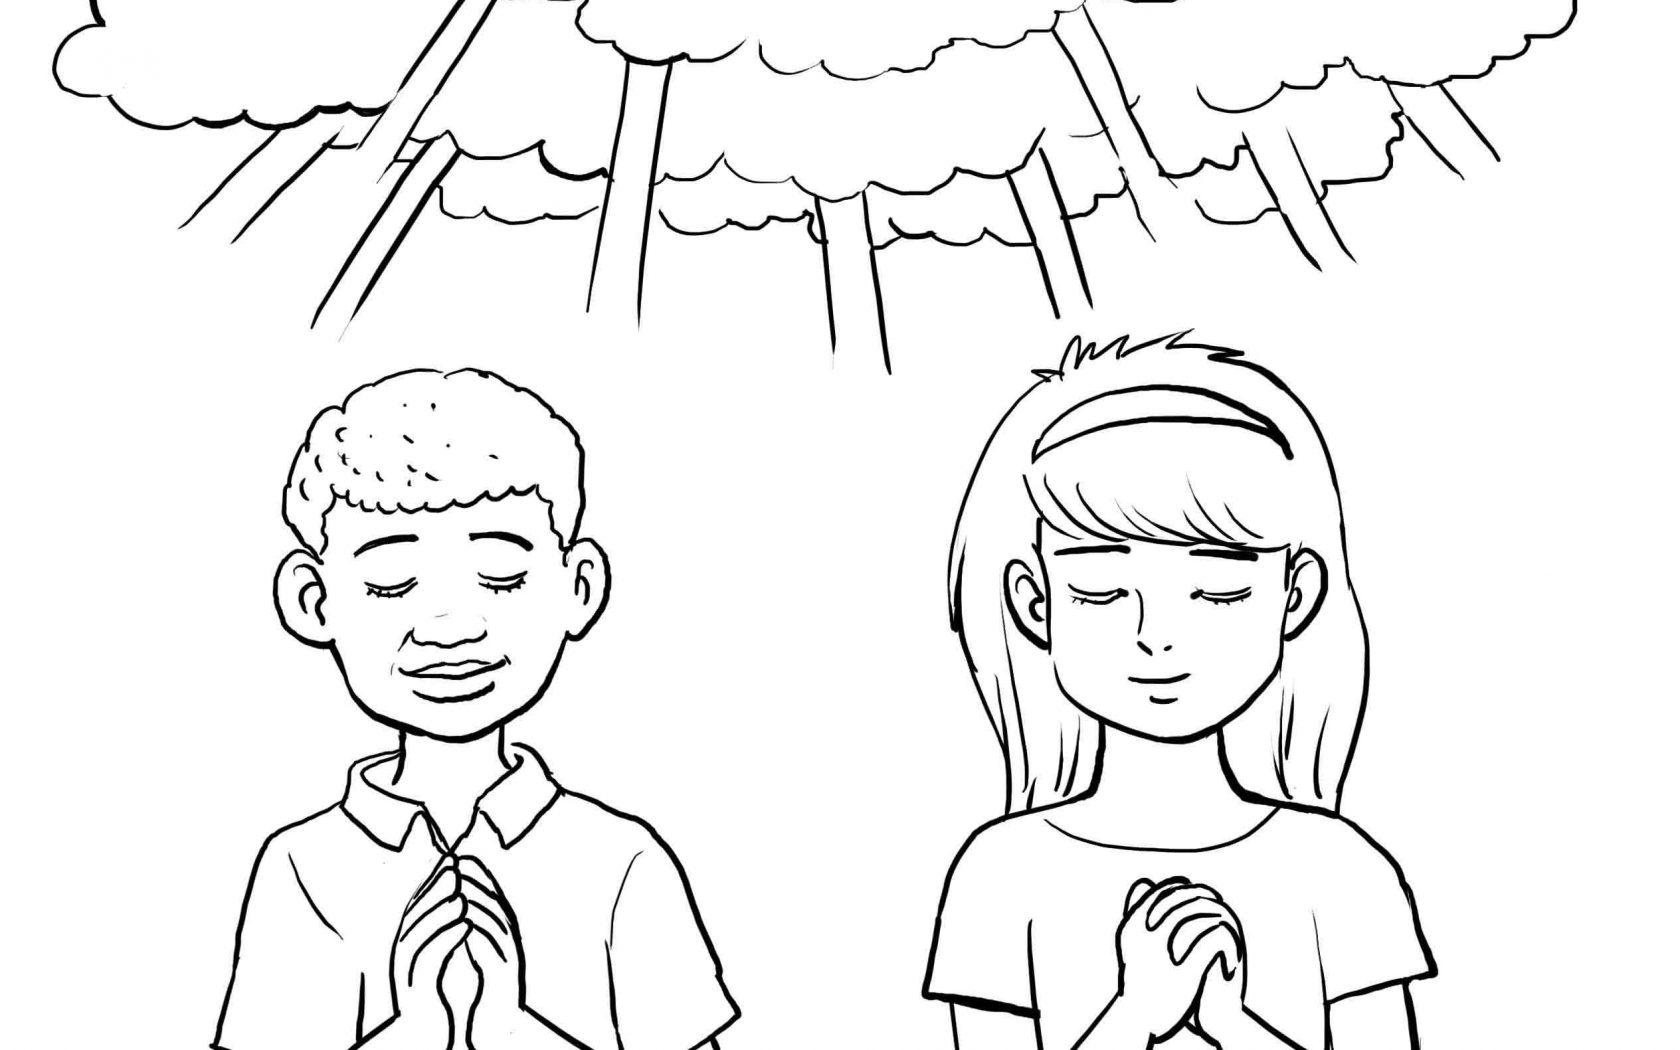 1680x1050 Unusual Child Praying Coloring Page Mantis Col